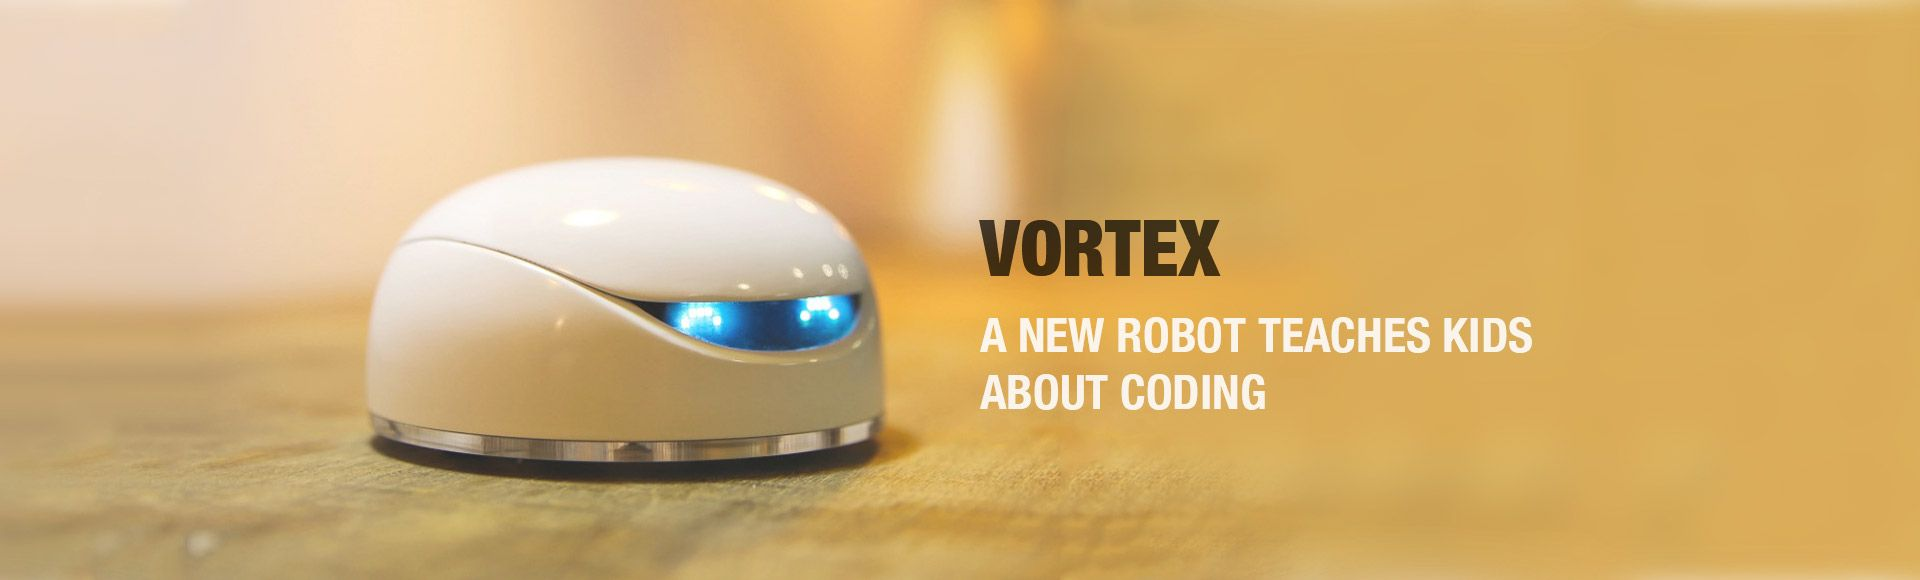 Vortex Robot - A revolutionary product for children